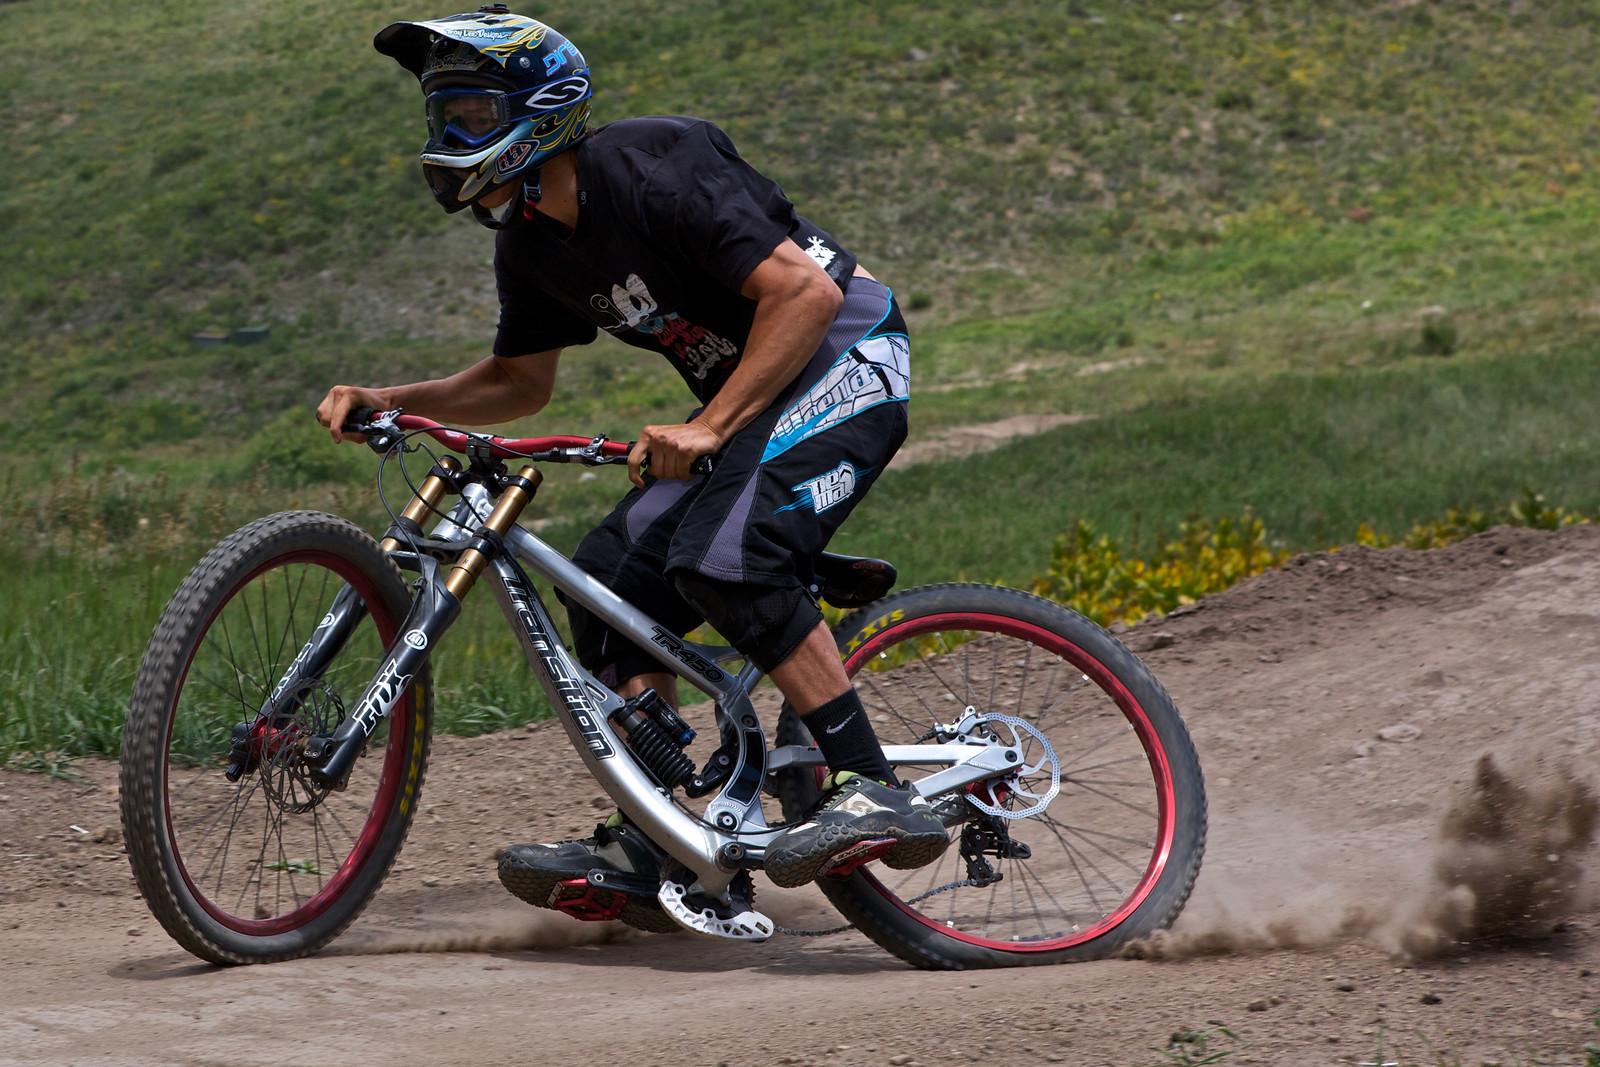 gettin rowdy - 303rider - Mountain Biking Pictures - Vital MTB